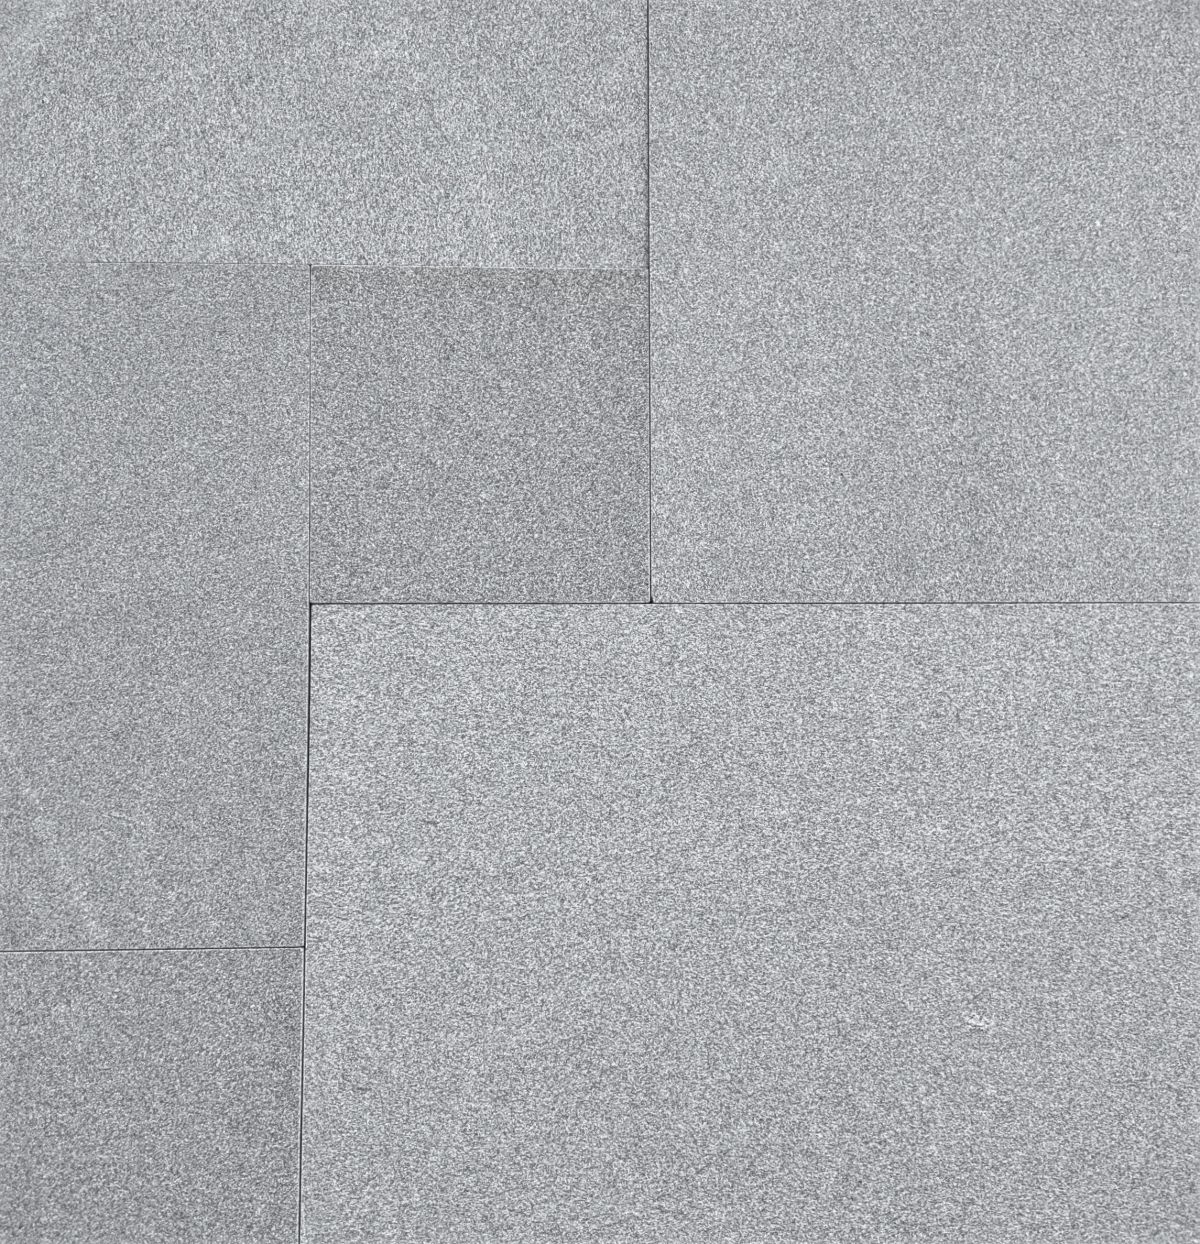 Pavers   Castle Grey Granite Thermal   Swatch (2)